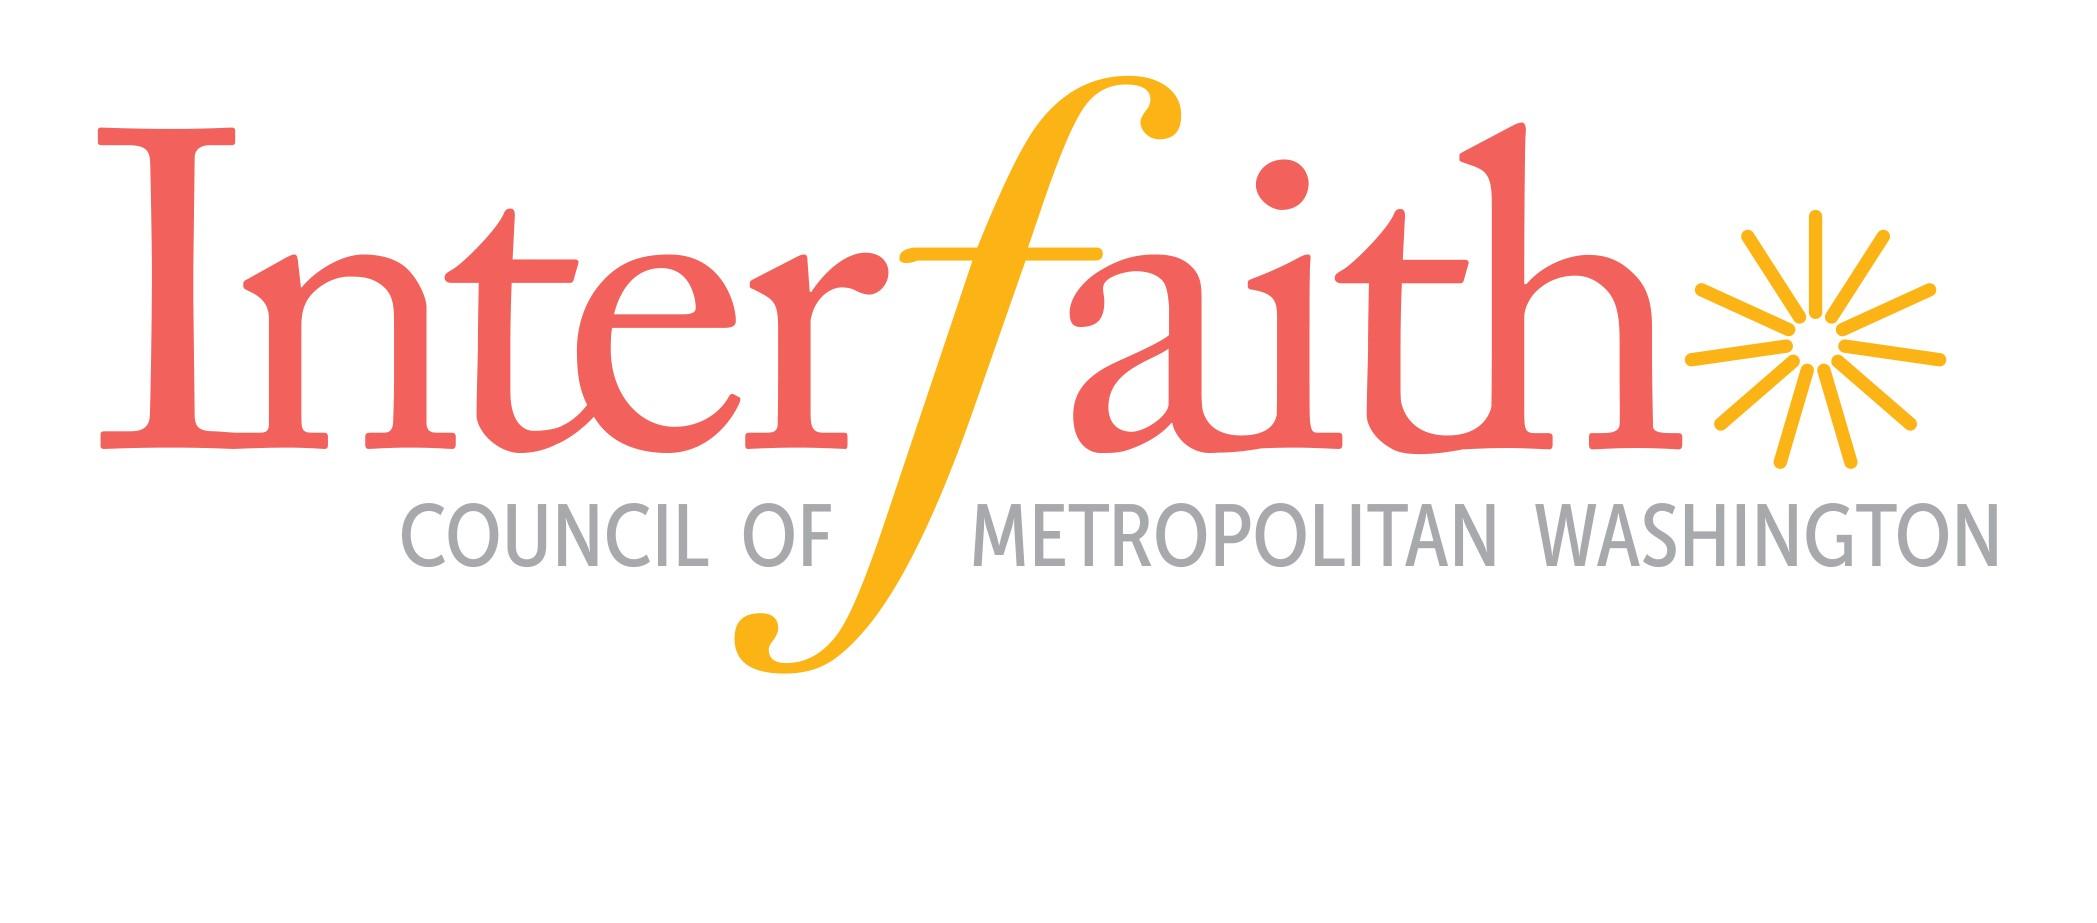 Interfaith Council of Metropolitan Washington | LinkedIn